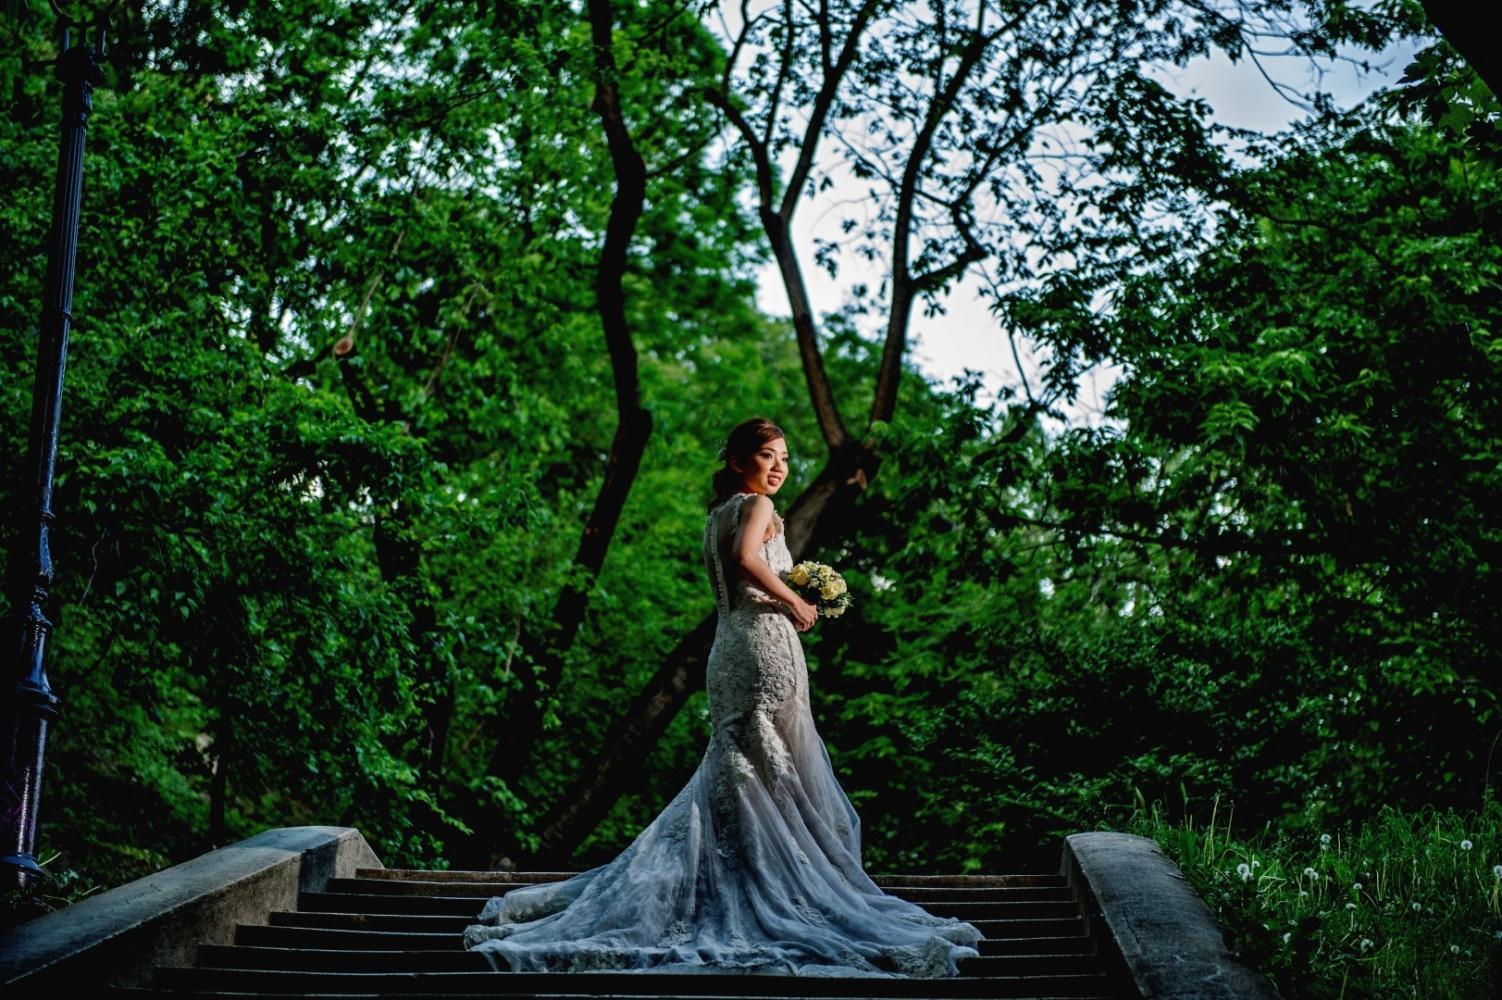 http://www.fotoz.sk/images/gallery-43/normal/svadobny-fotograf_svadobne-fotky_prewedding-budapest_juraj-zsok_eskuvoi-fotos_eskuvoi-fotozas_013.jpg